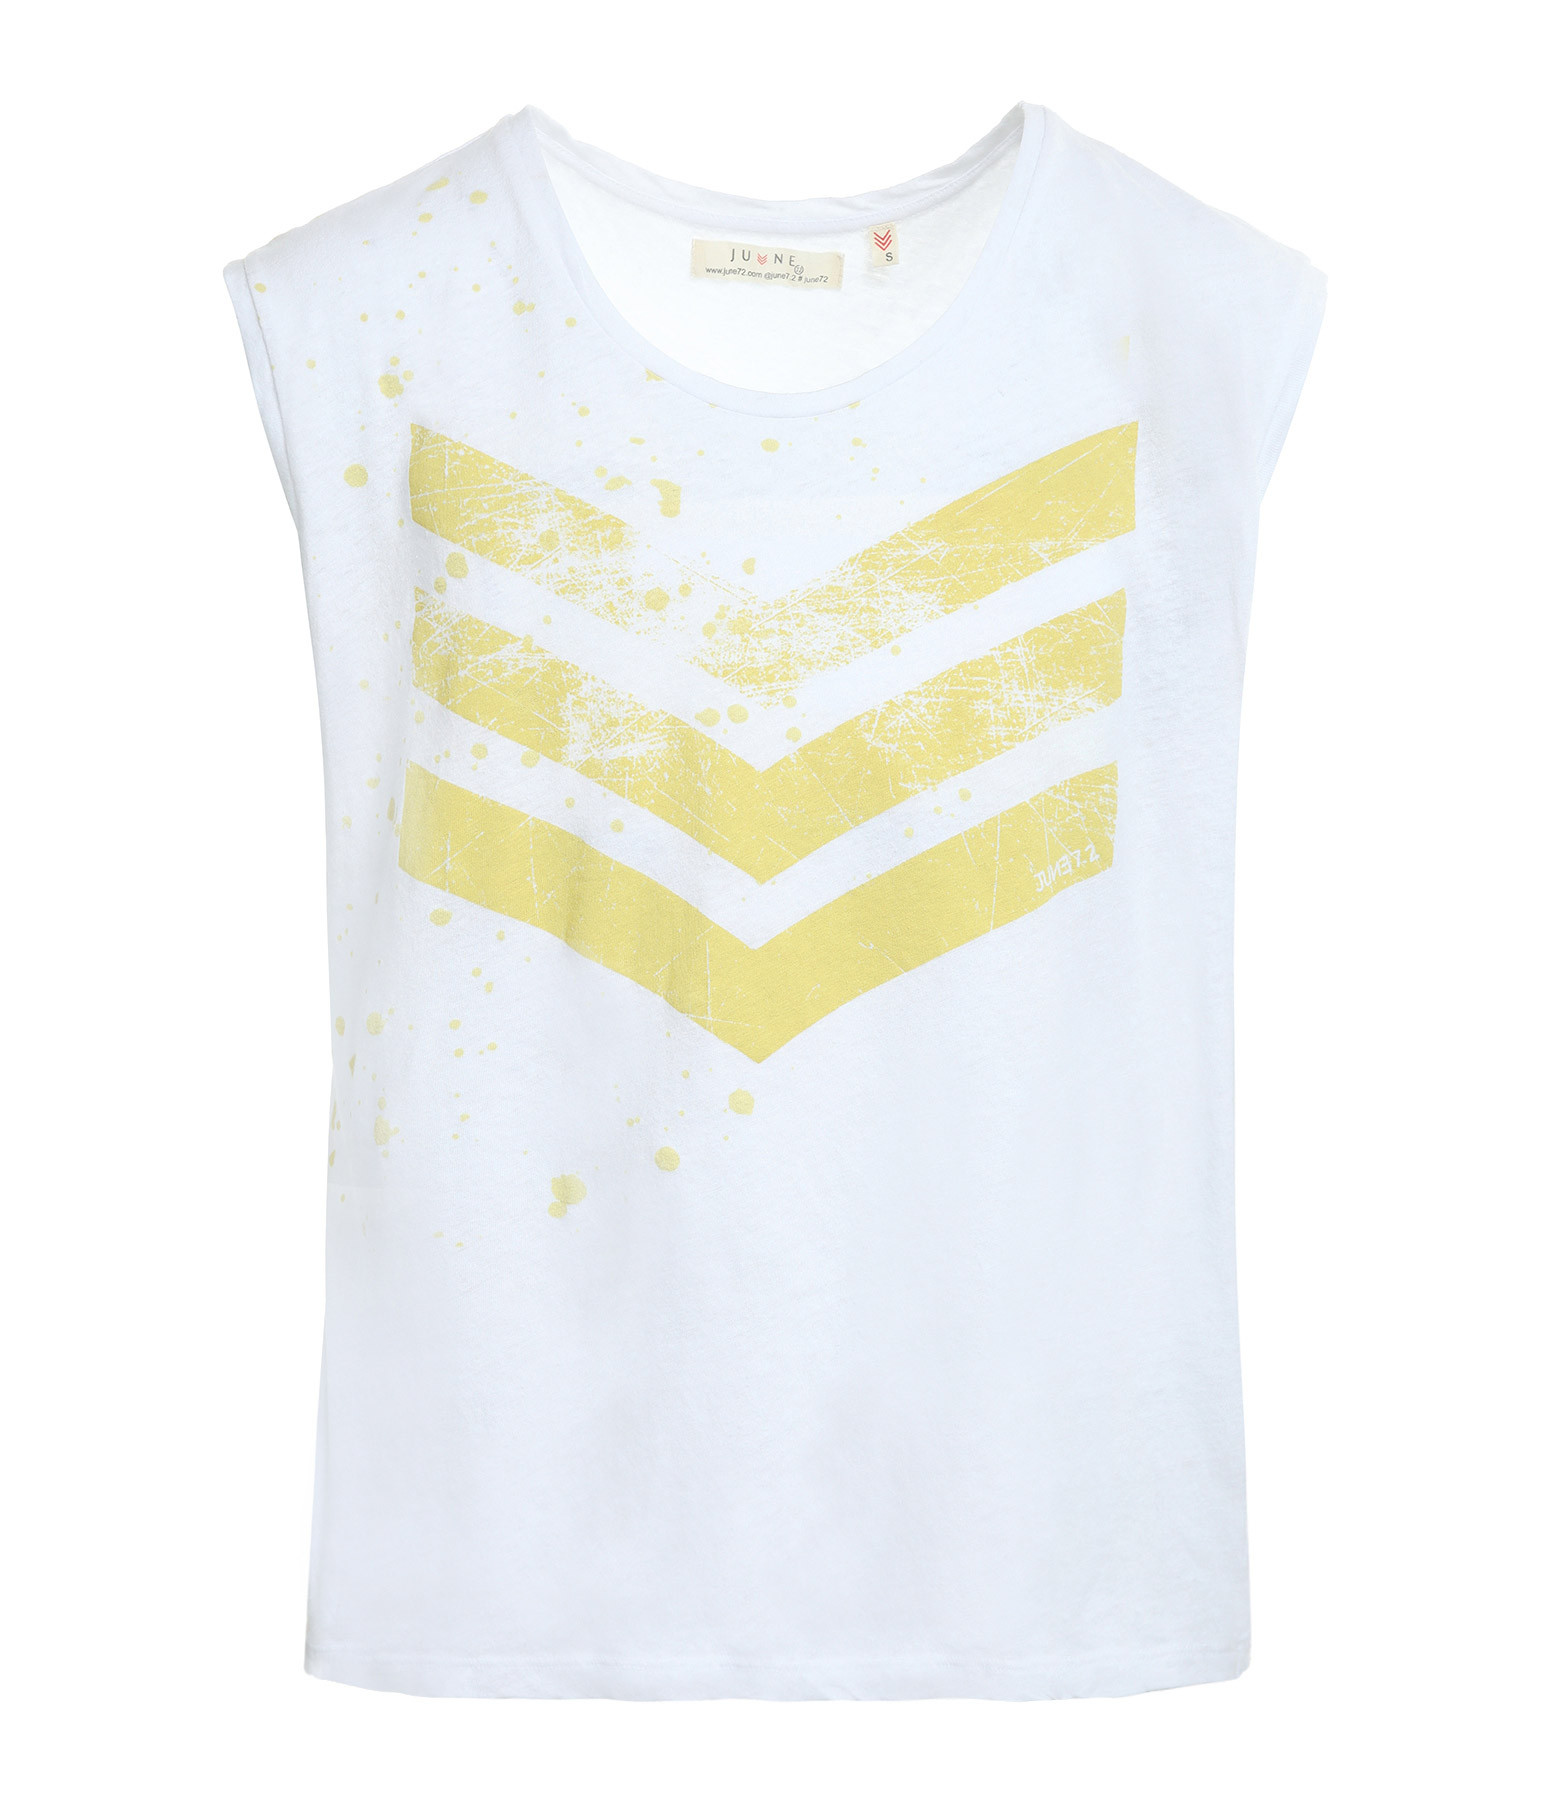 JUNE 7.2 - Tee-shirt Hayden Logo Splash Blanc Jaune